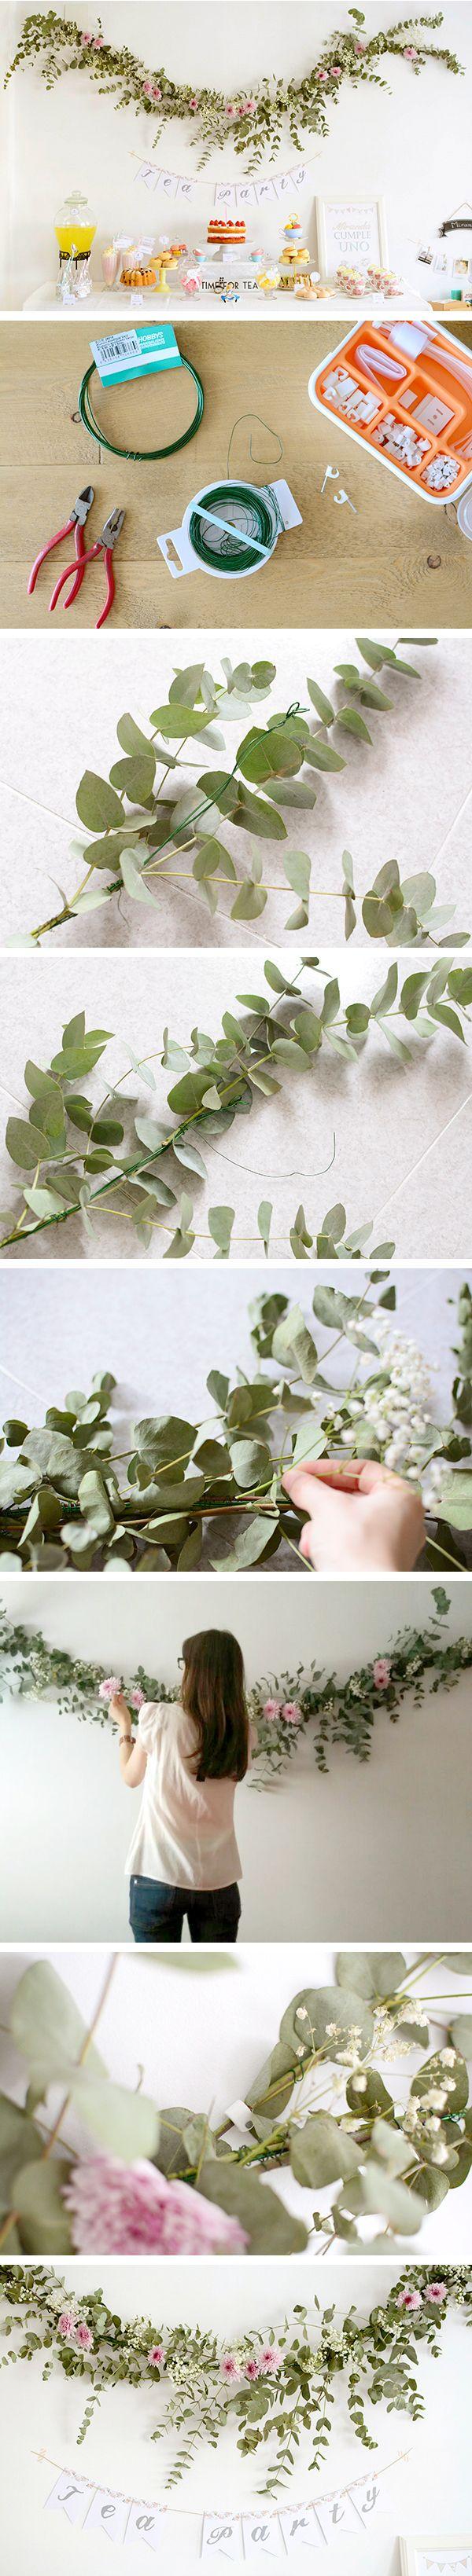 DIY: Flower garland - Guirnalda de flores naturales